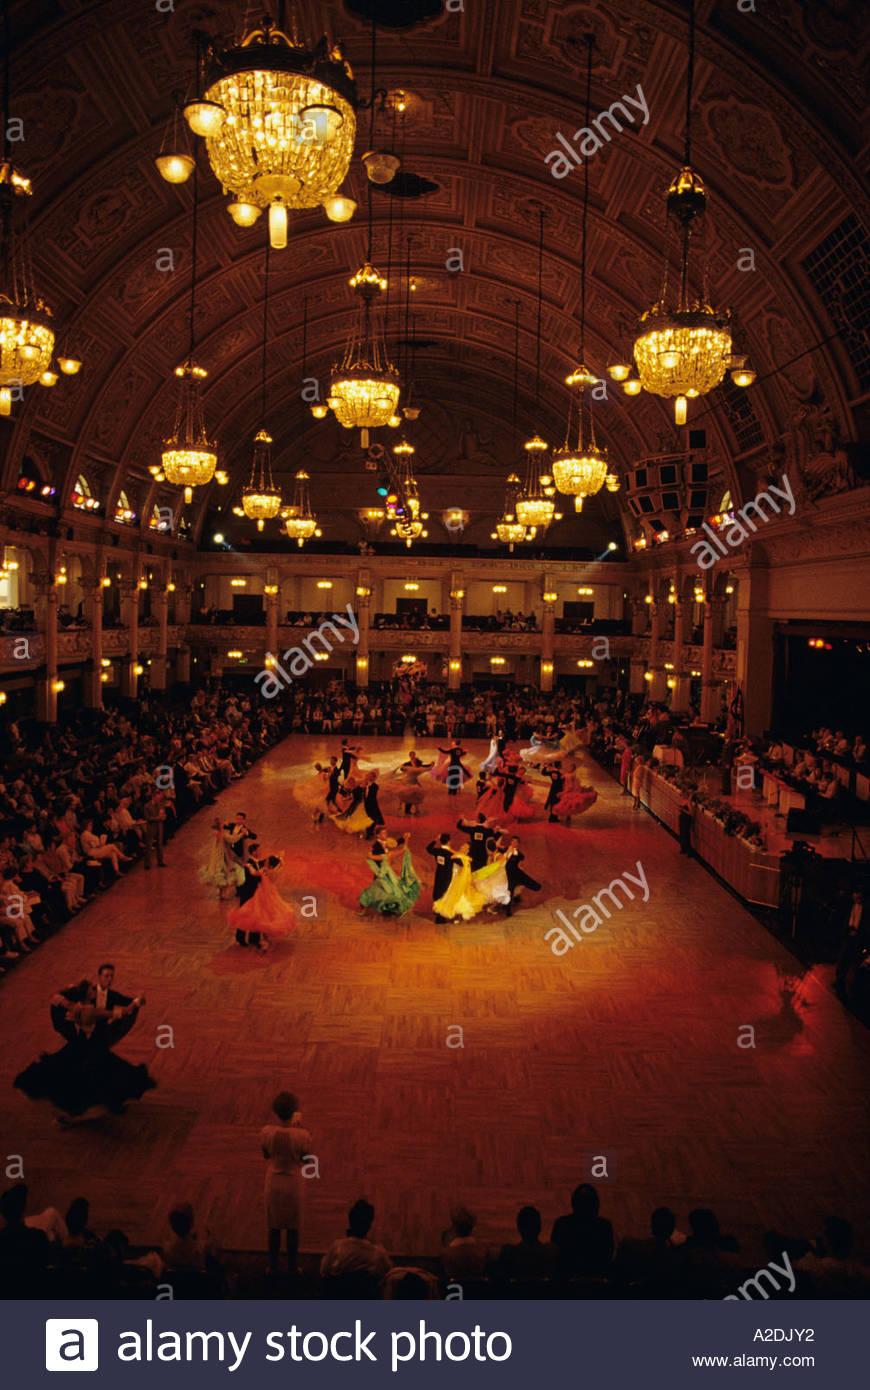 waltz competition ballroom dancing winter gardens blackpool